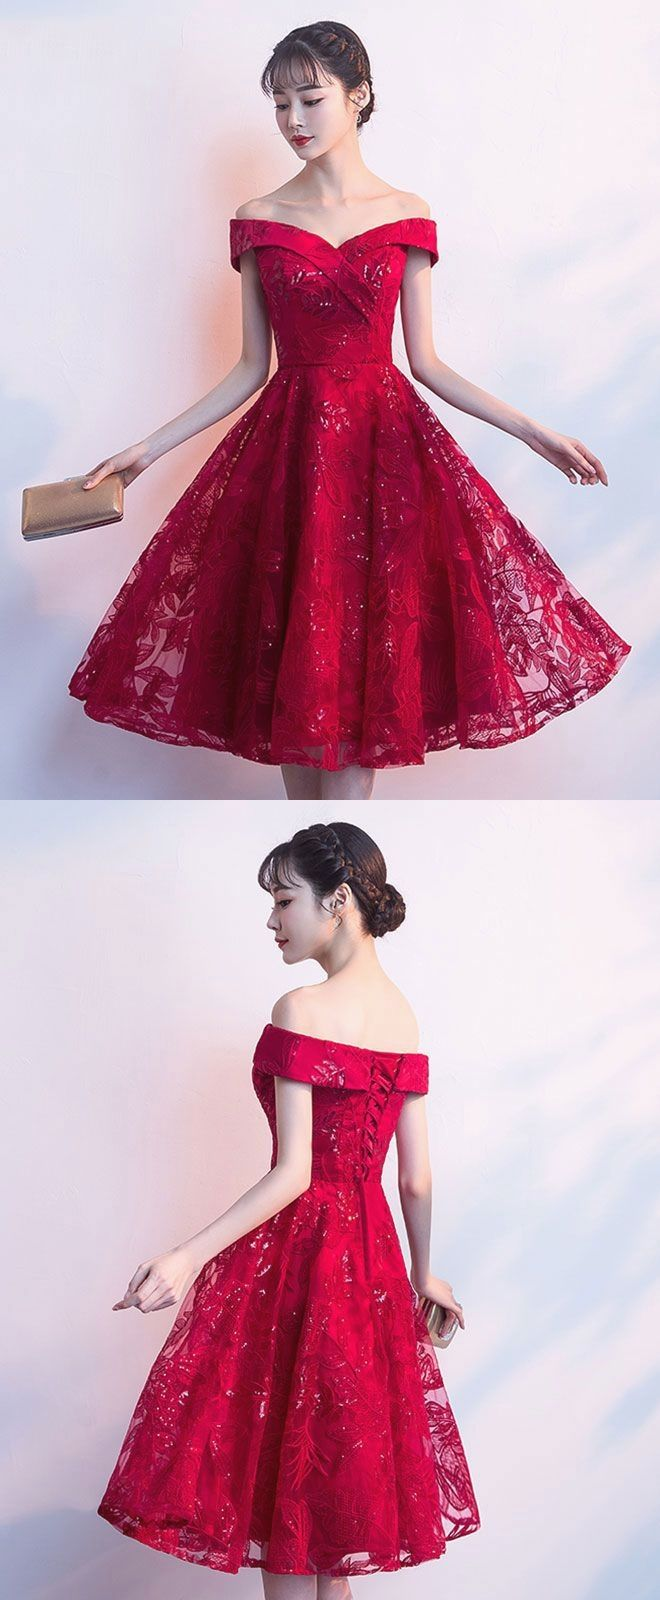 Description cute burgundy short prom dress homecoming dress